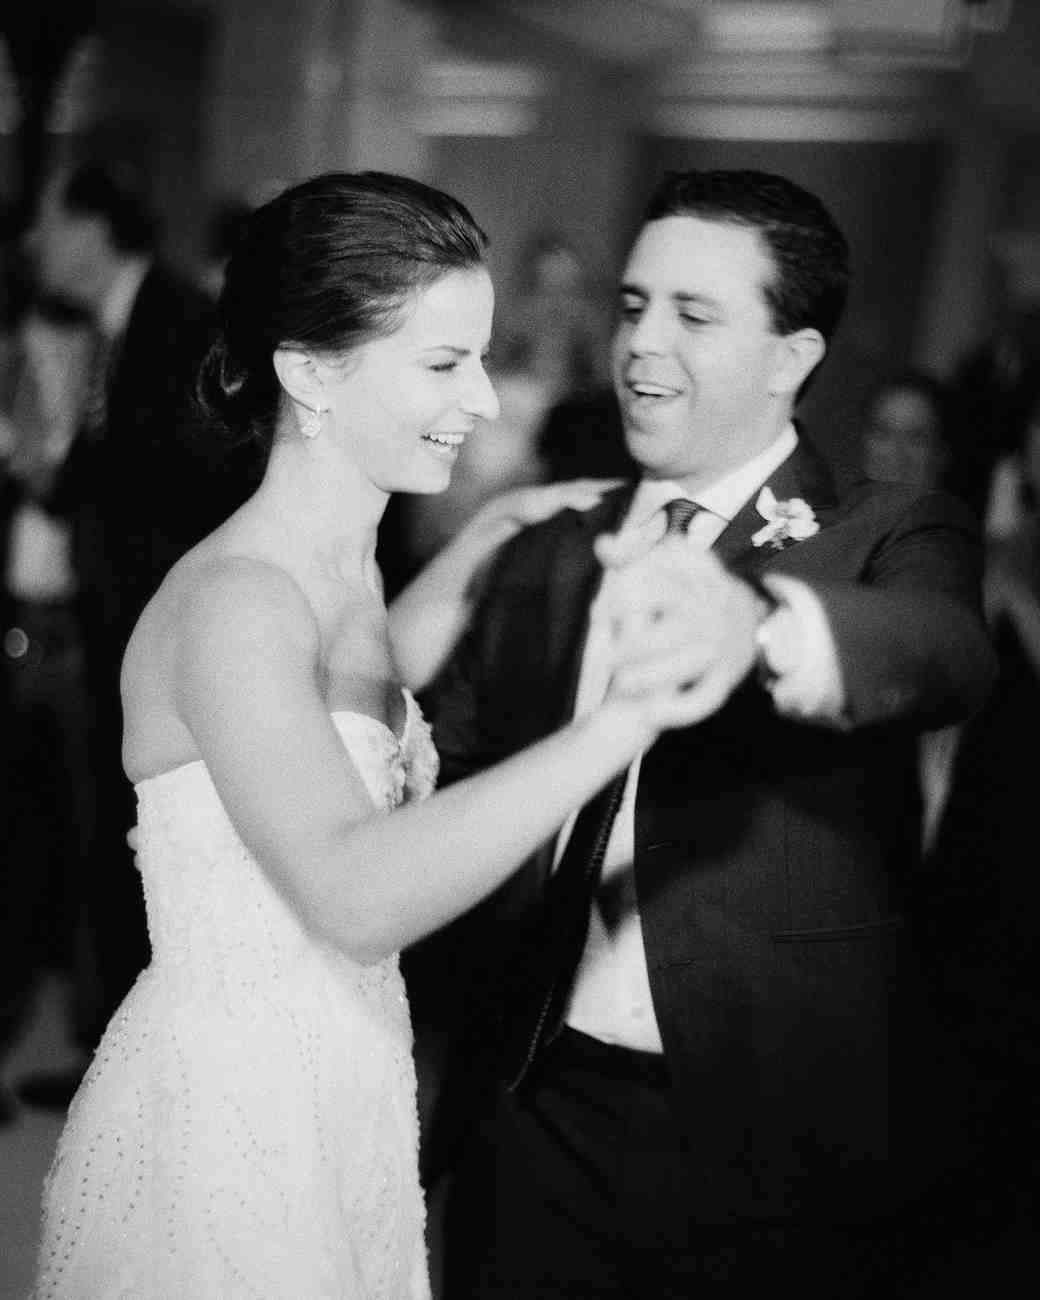 tali-mike-wedding-california-dancing-85050009-s112346.jpg